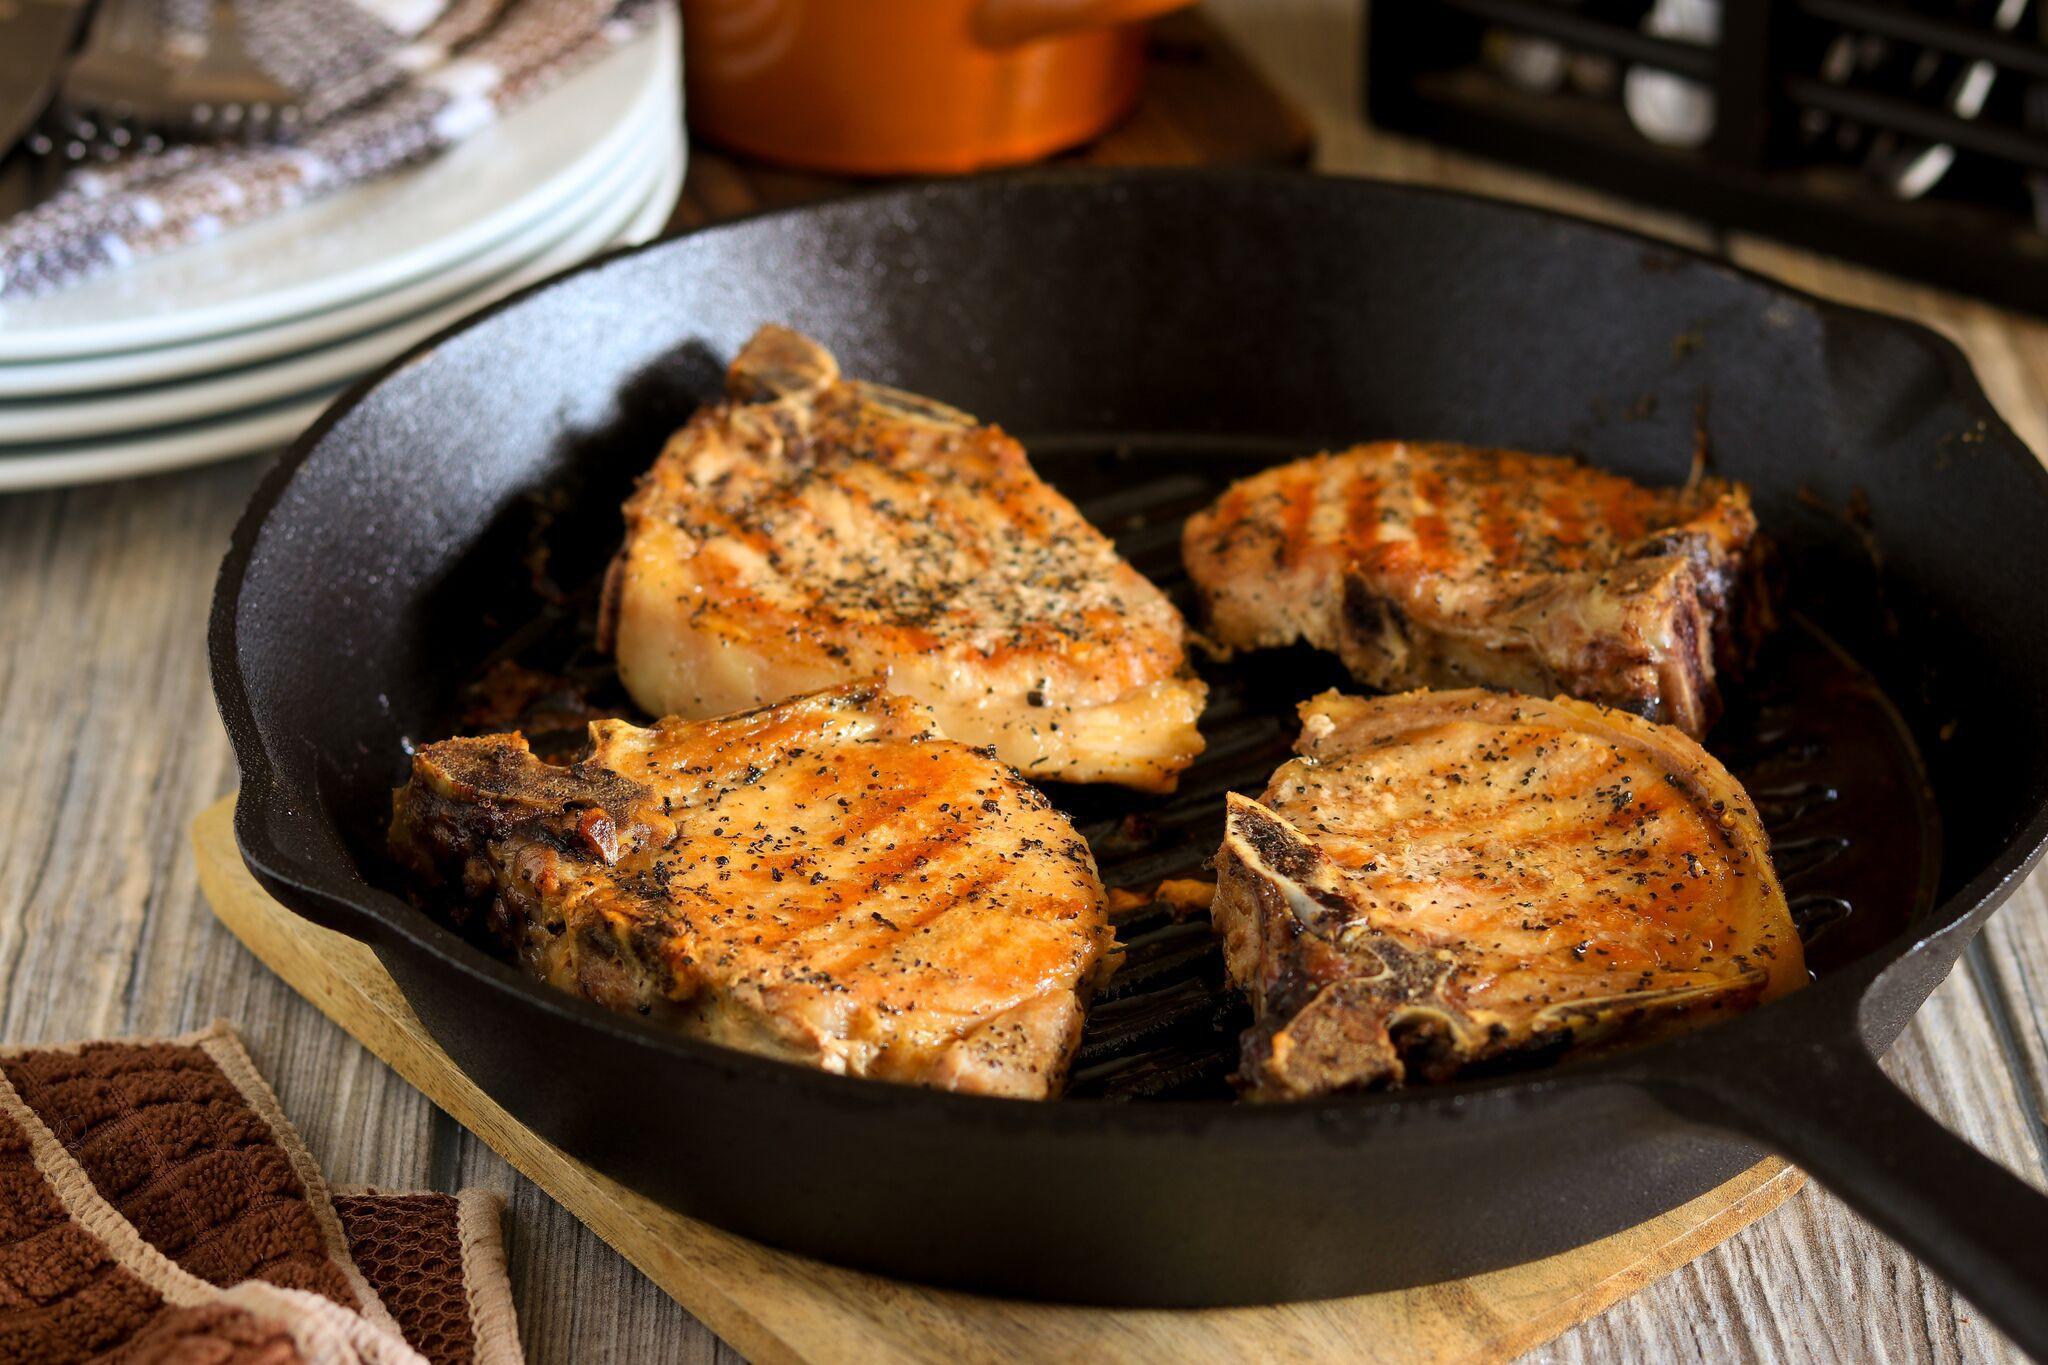 Oven Roasted Pork Chops  Oven Roasted Pork Chops Recipe